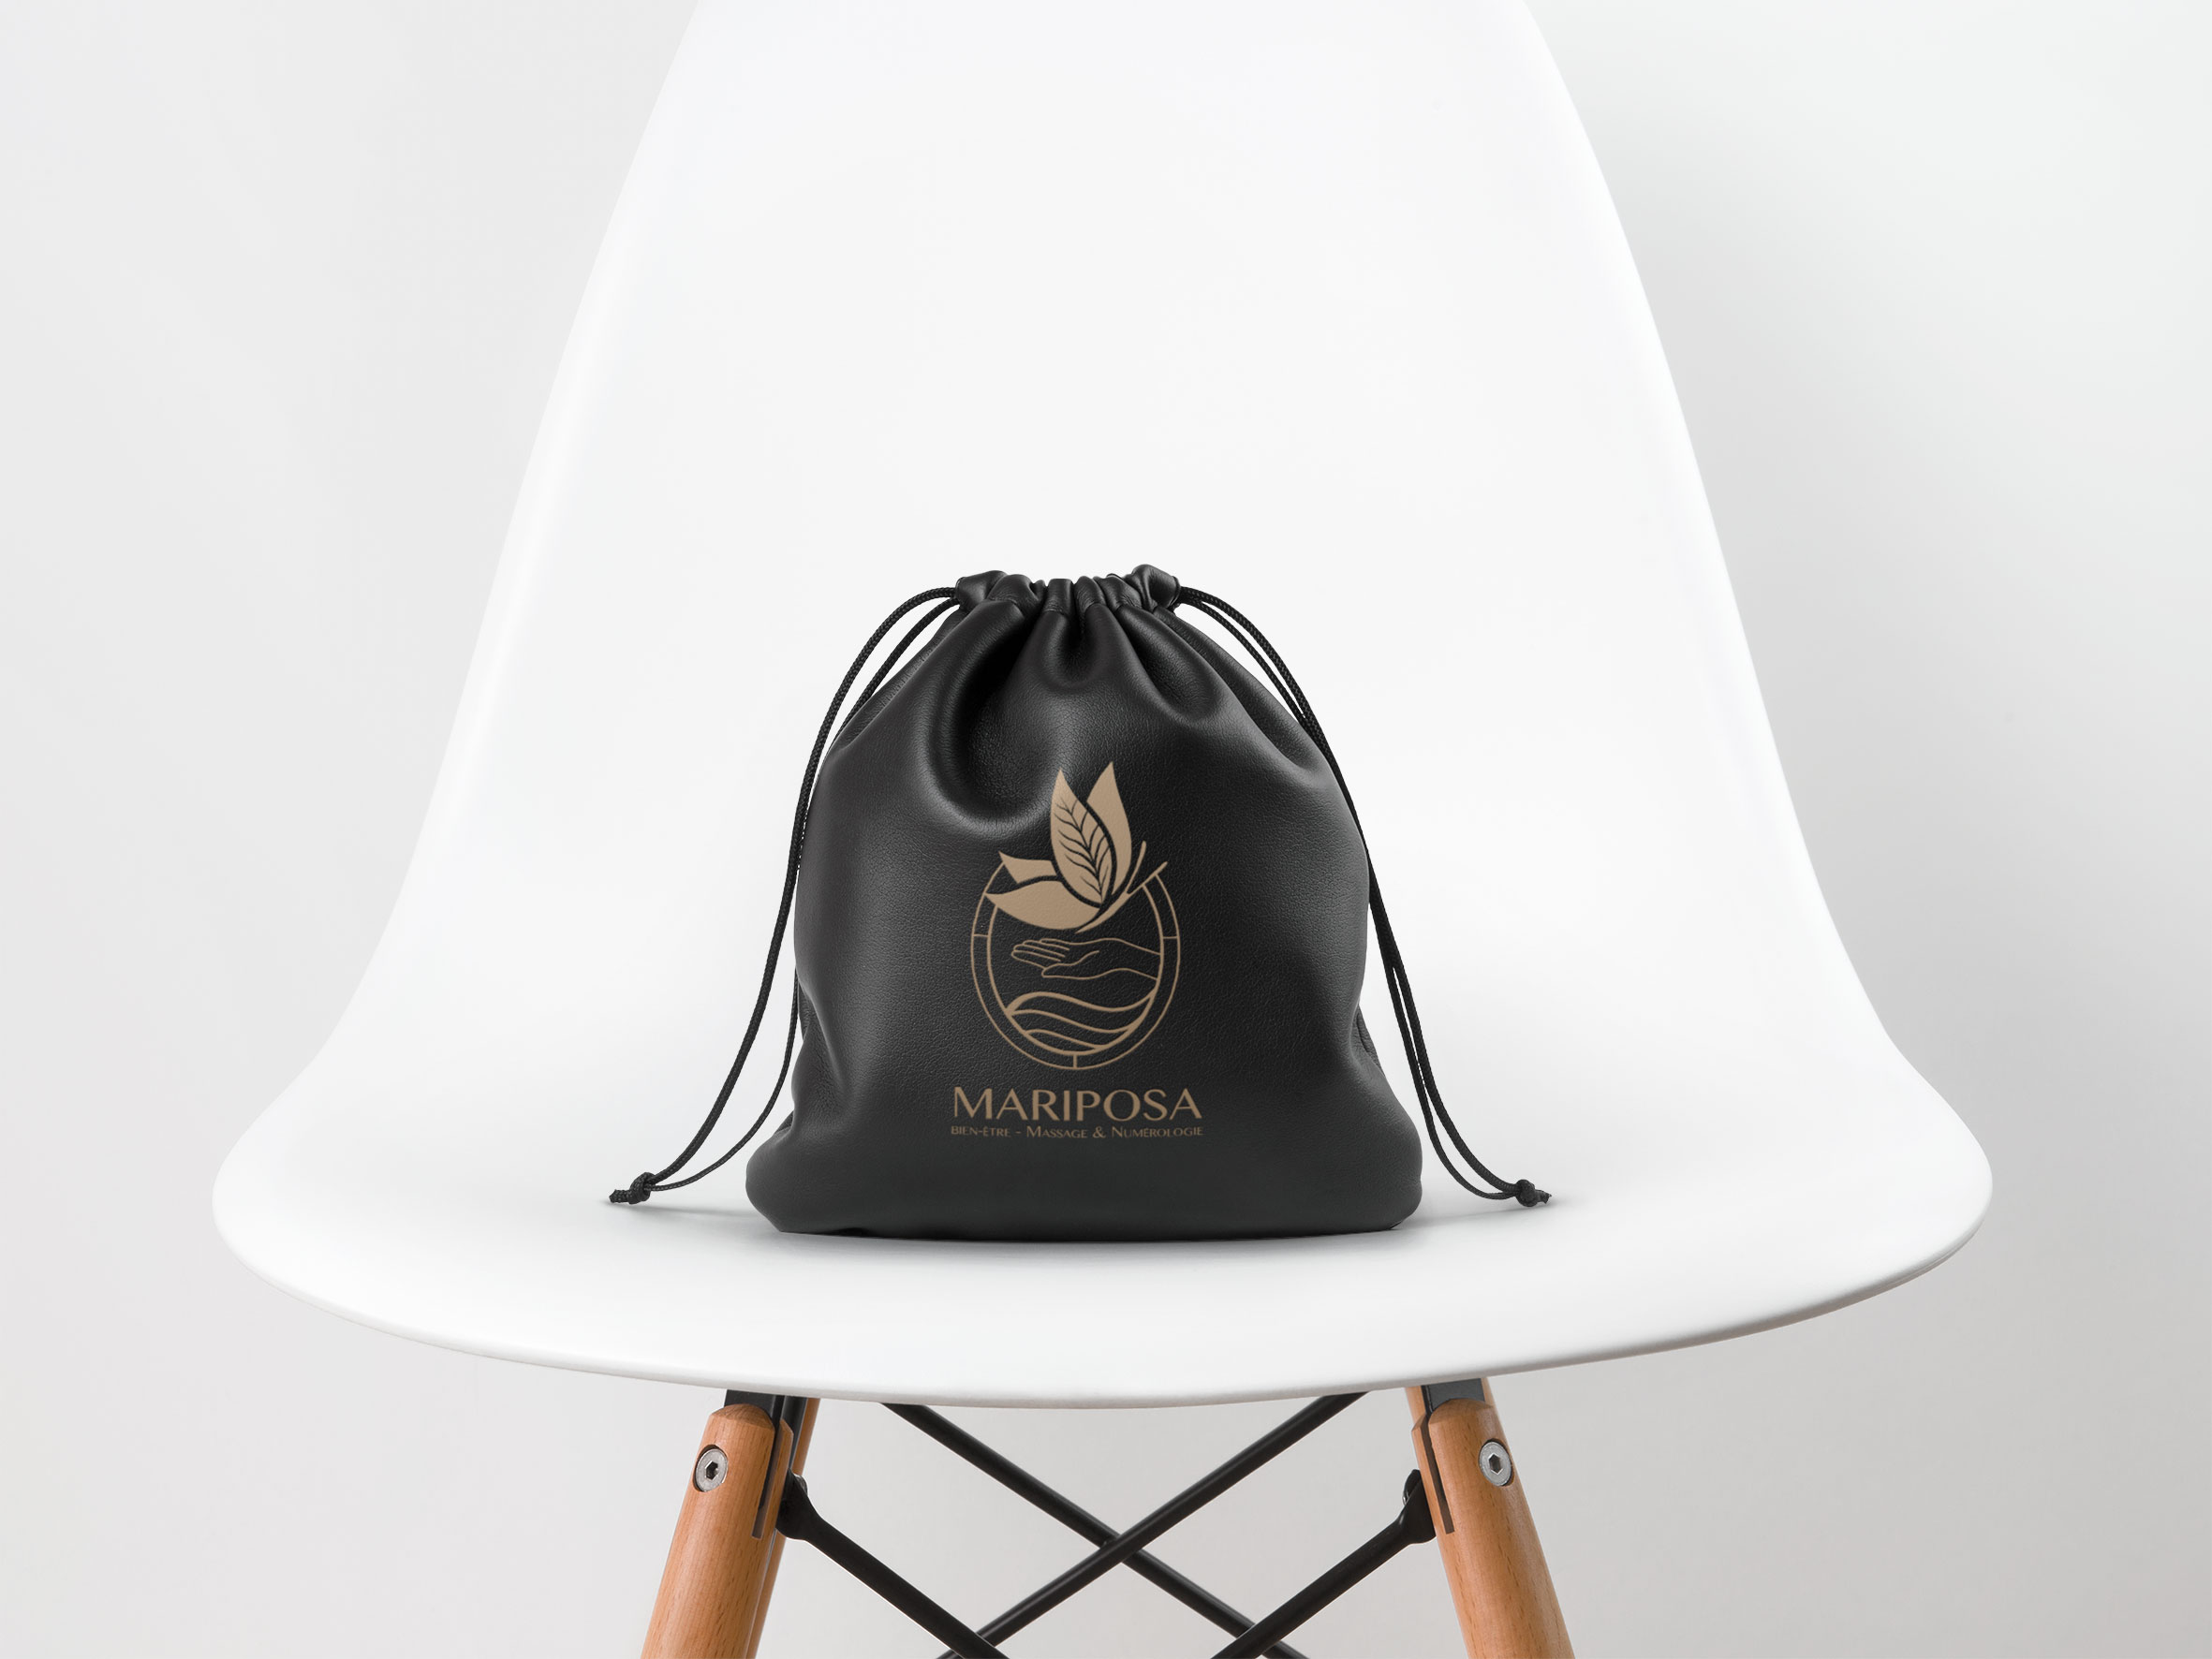 sac-chaise-mariposa-capbreton-bienetre-numerologie-massage-skoncommunication-sac